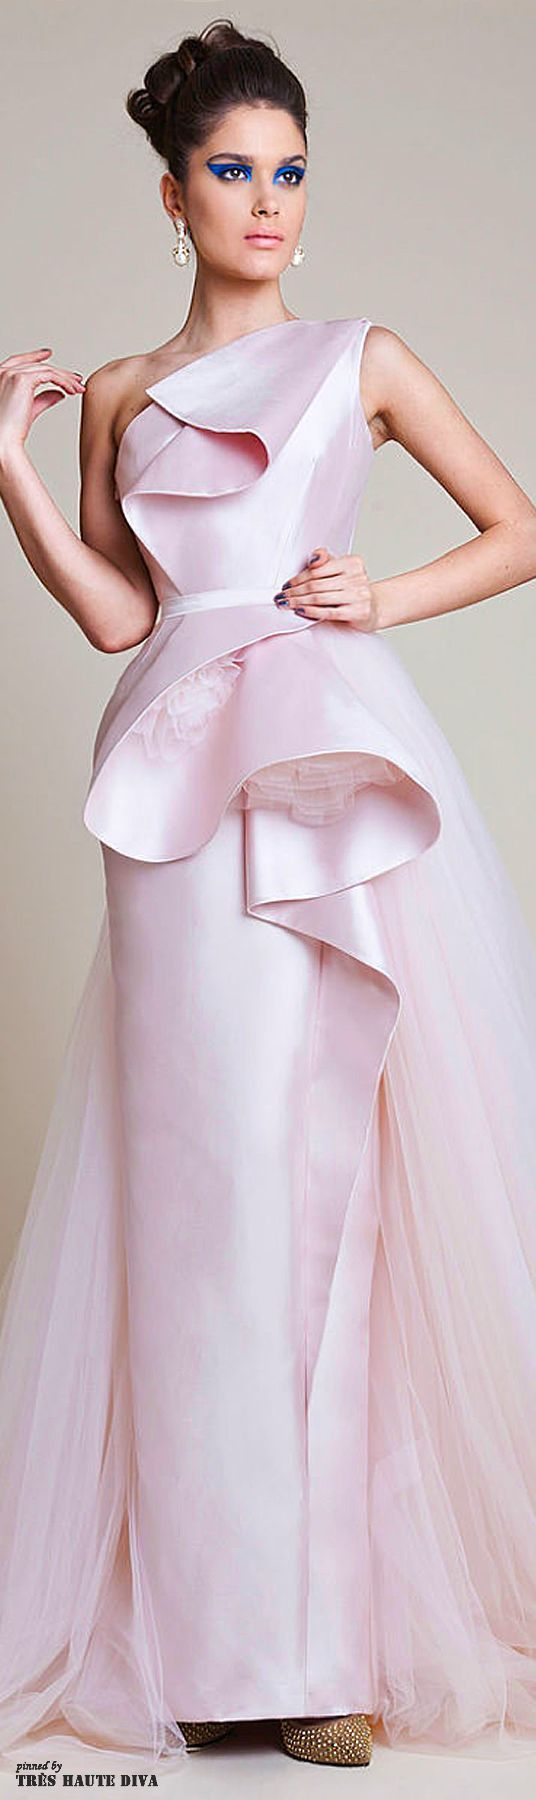 Azzi Osta   Spring 2014 Couture